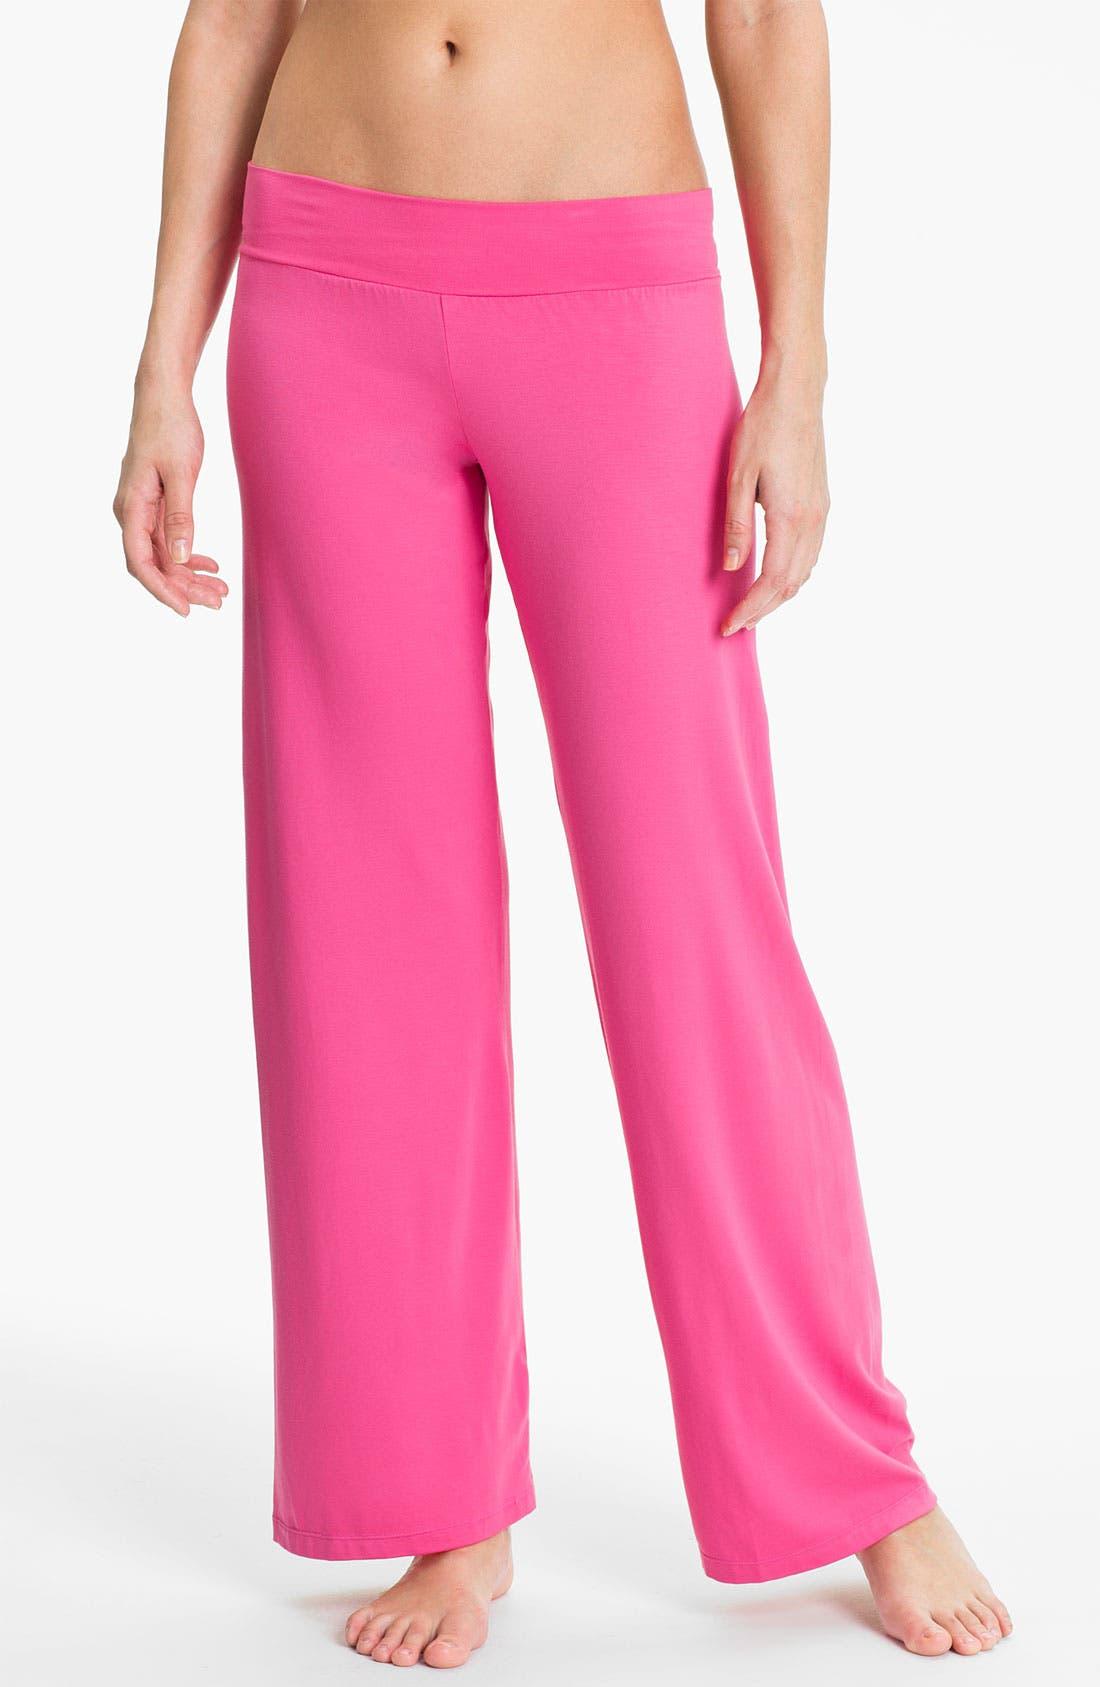 Main Image - Cosabella 'Talco' Lounge Pants